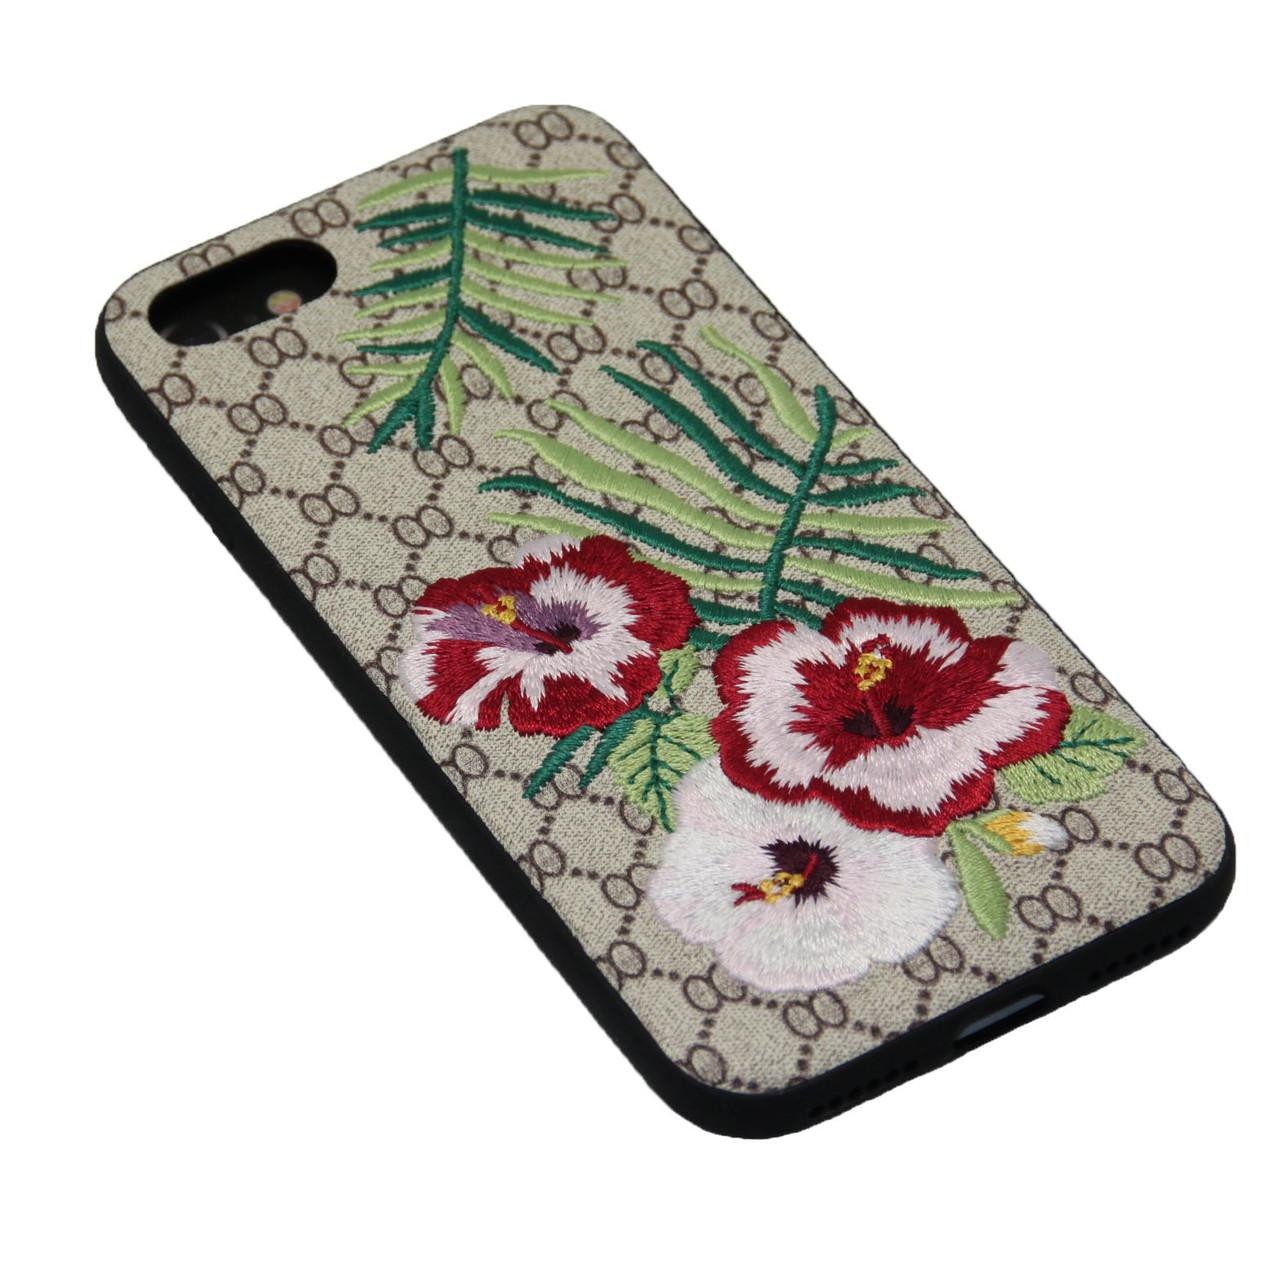 Чехол WK Embroidery iPhone 7 - фото 2